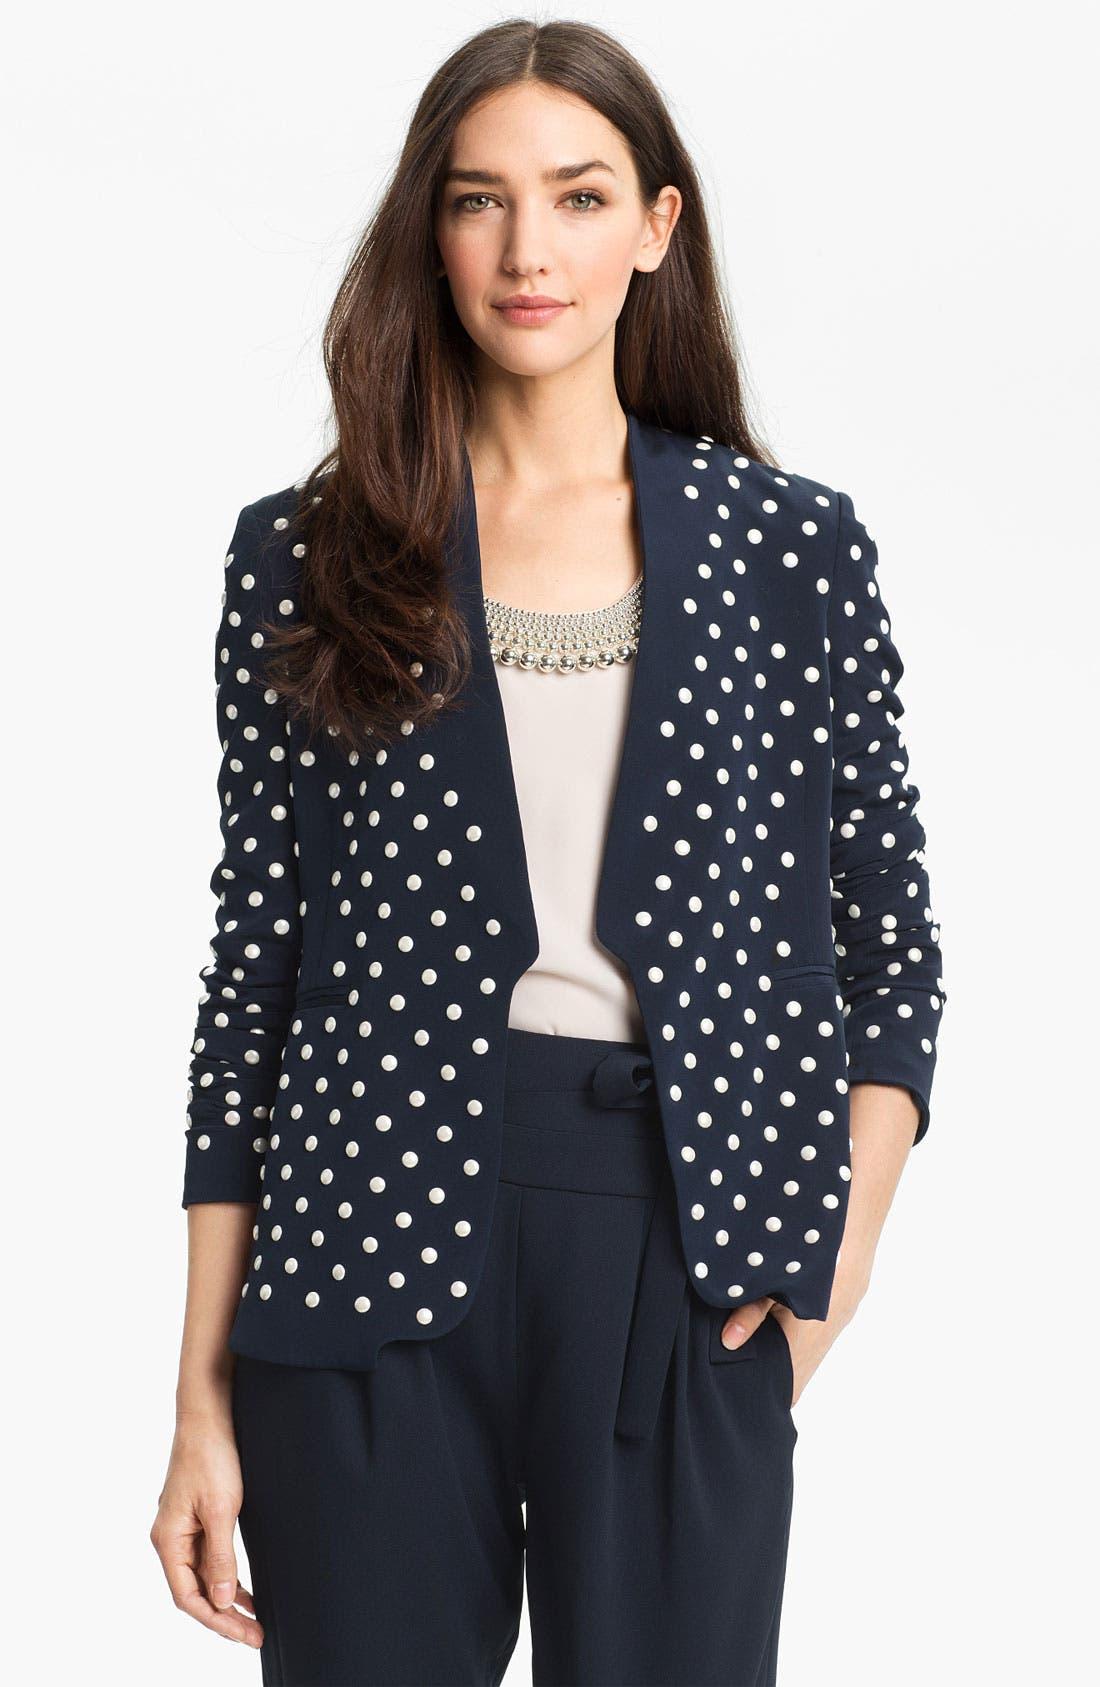 Main Image - Diane von Furstenberg 'Paulette' Studded Jacket